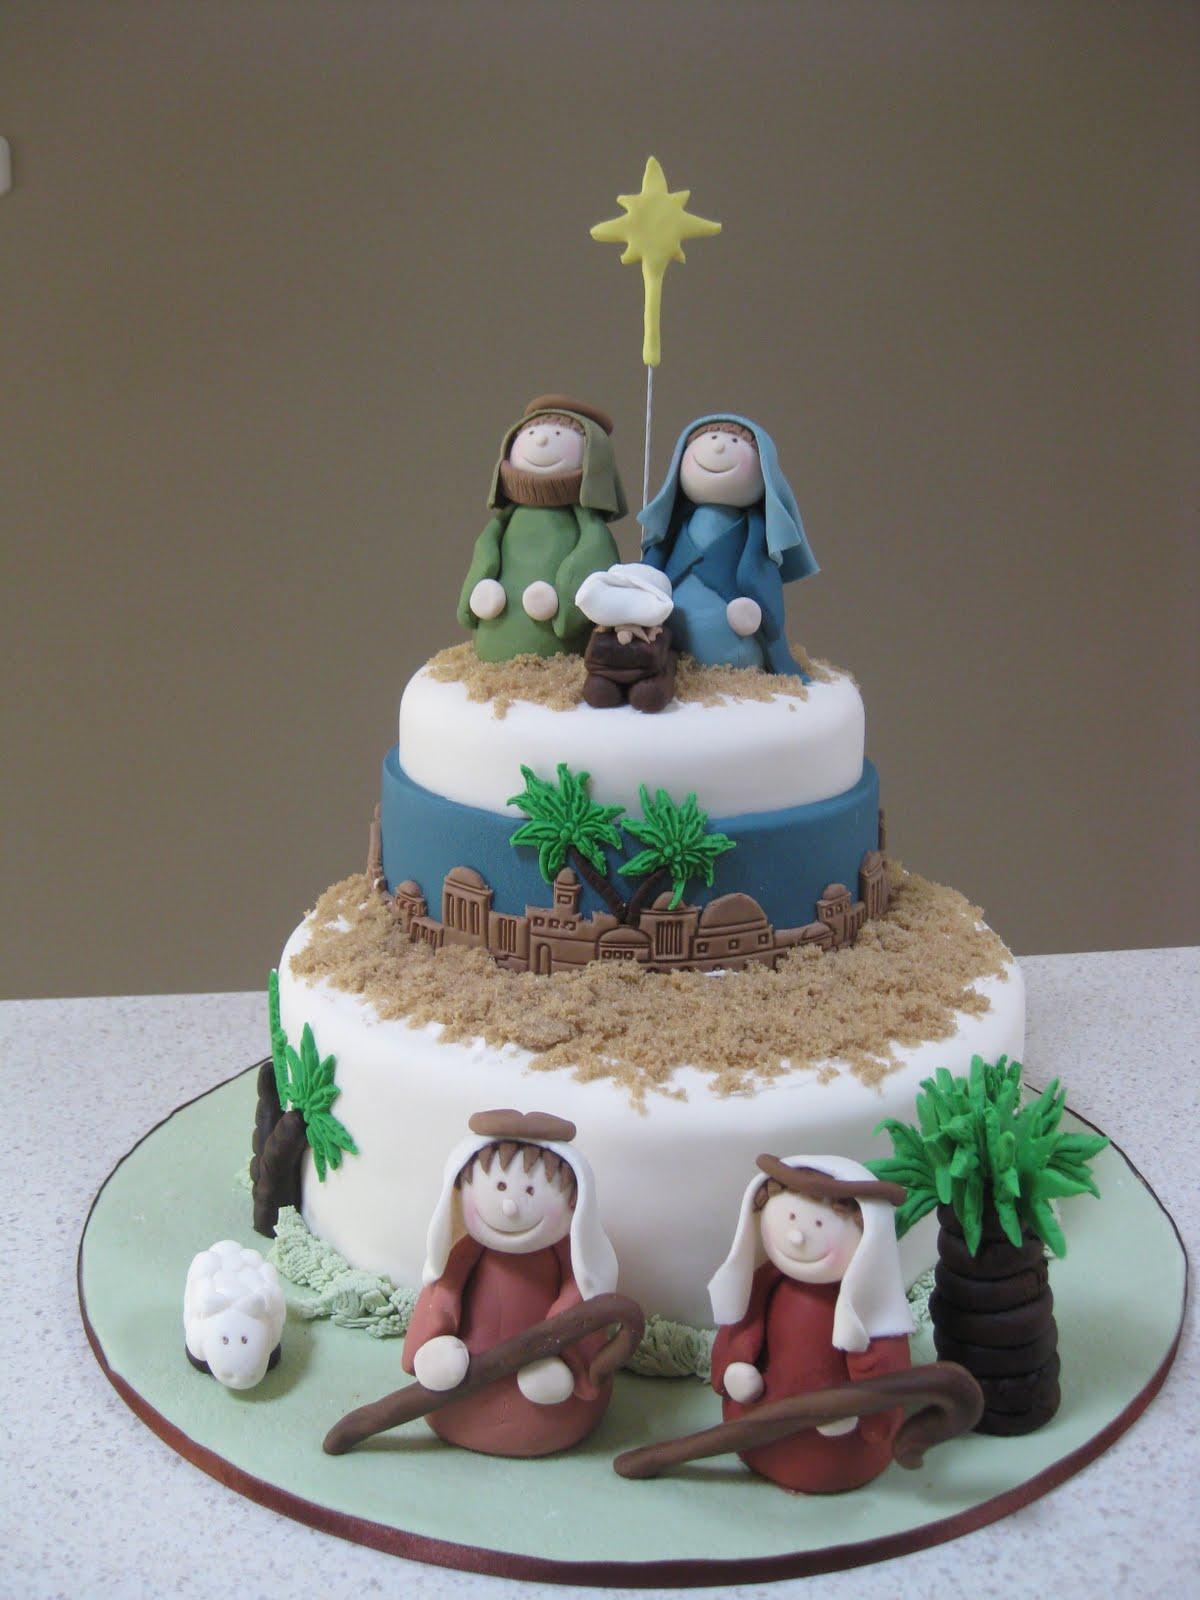 Nativity Christmas Cake Design : Christmas Cakes on Pinterest Snowman Cake, Winter Cakes ...